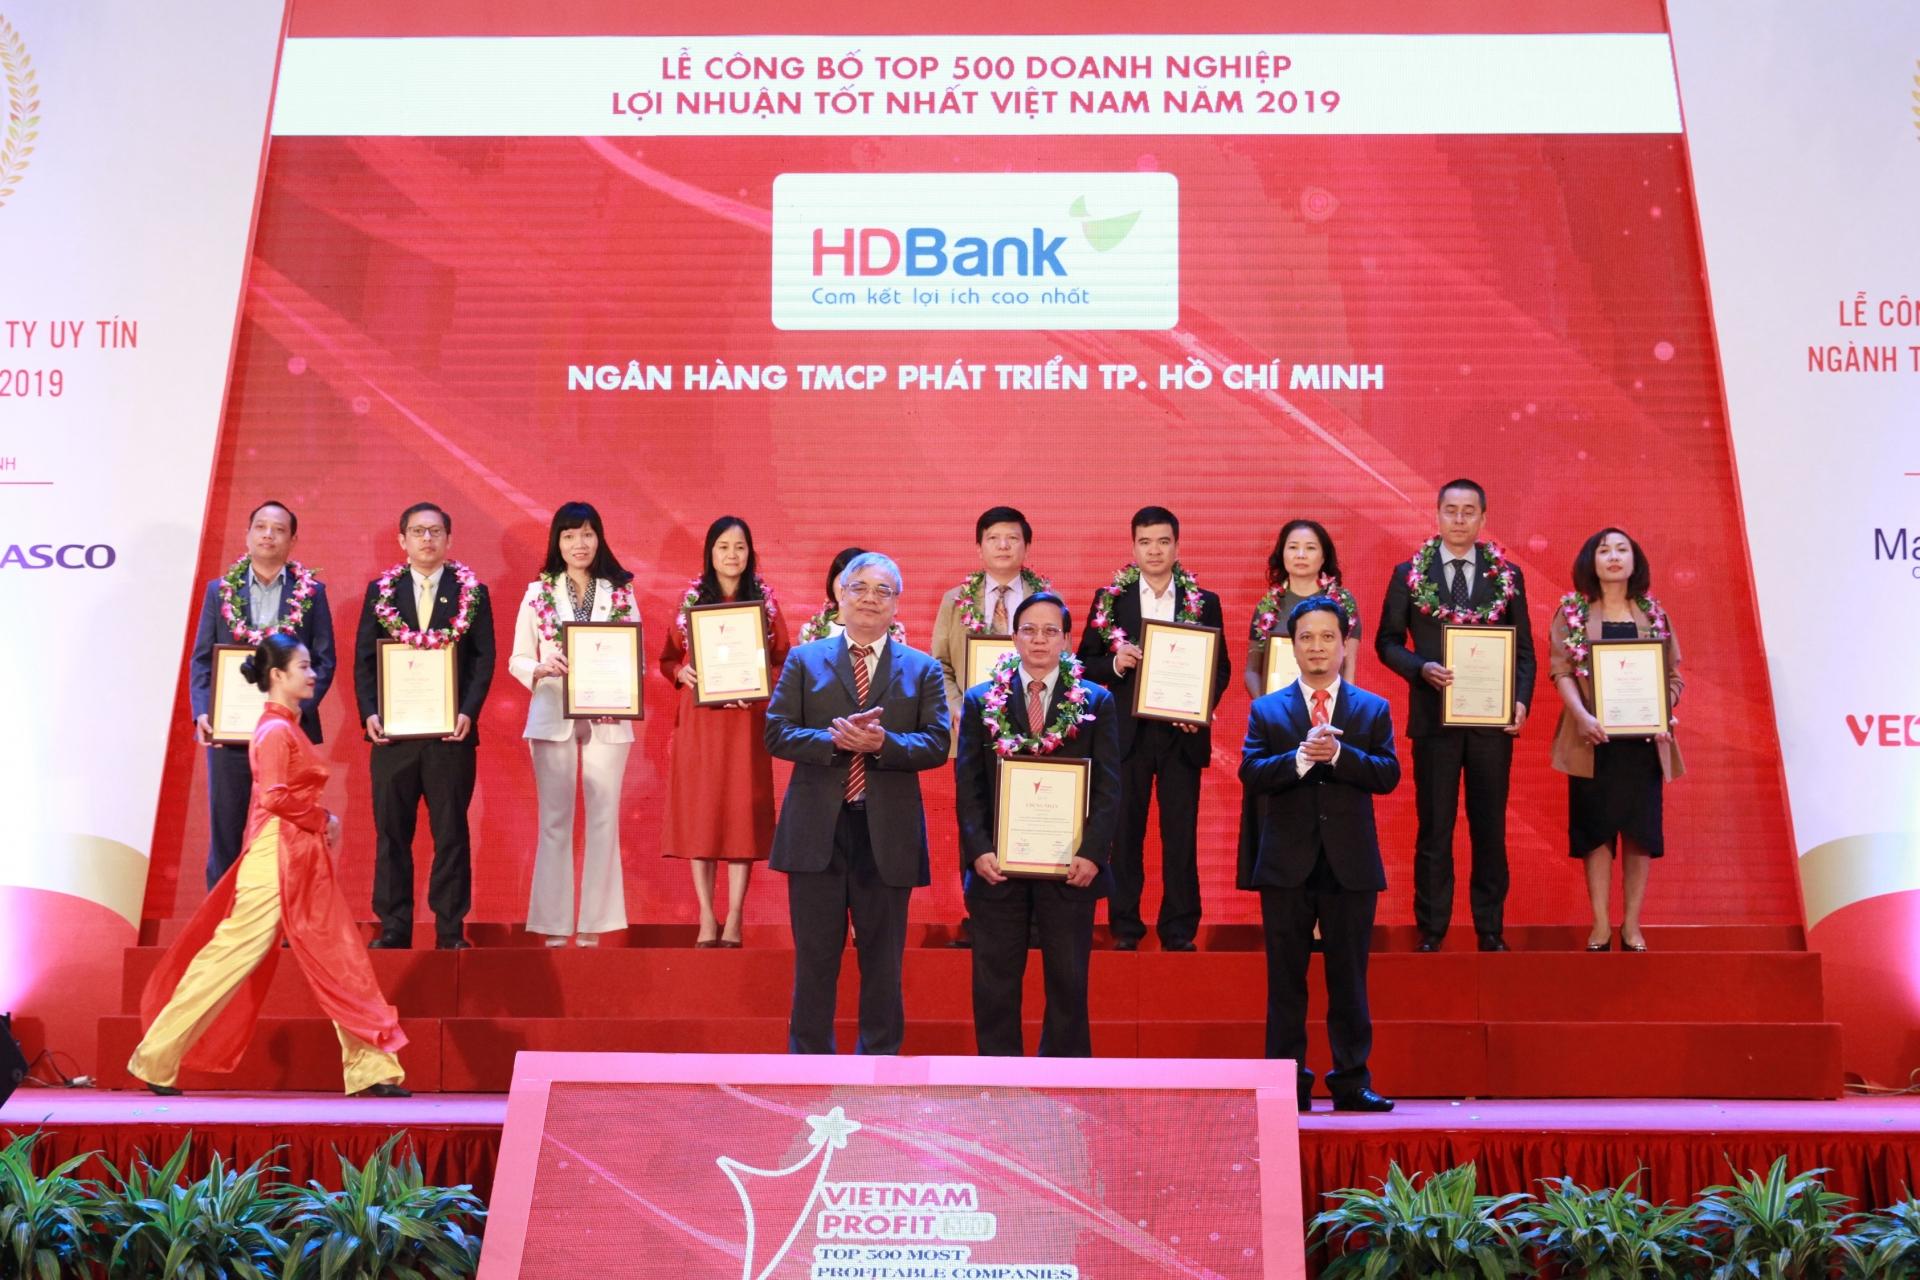 top 10 doanh nghiep nganh tai chinh ngan hang chung khoan co loi nhuan tot nhat